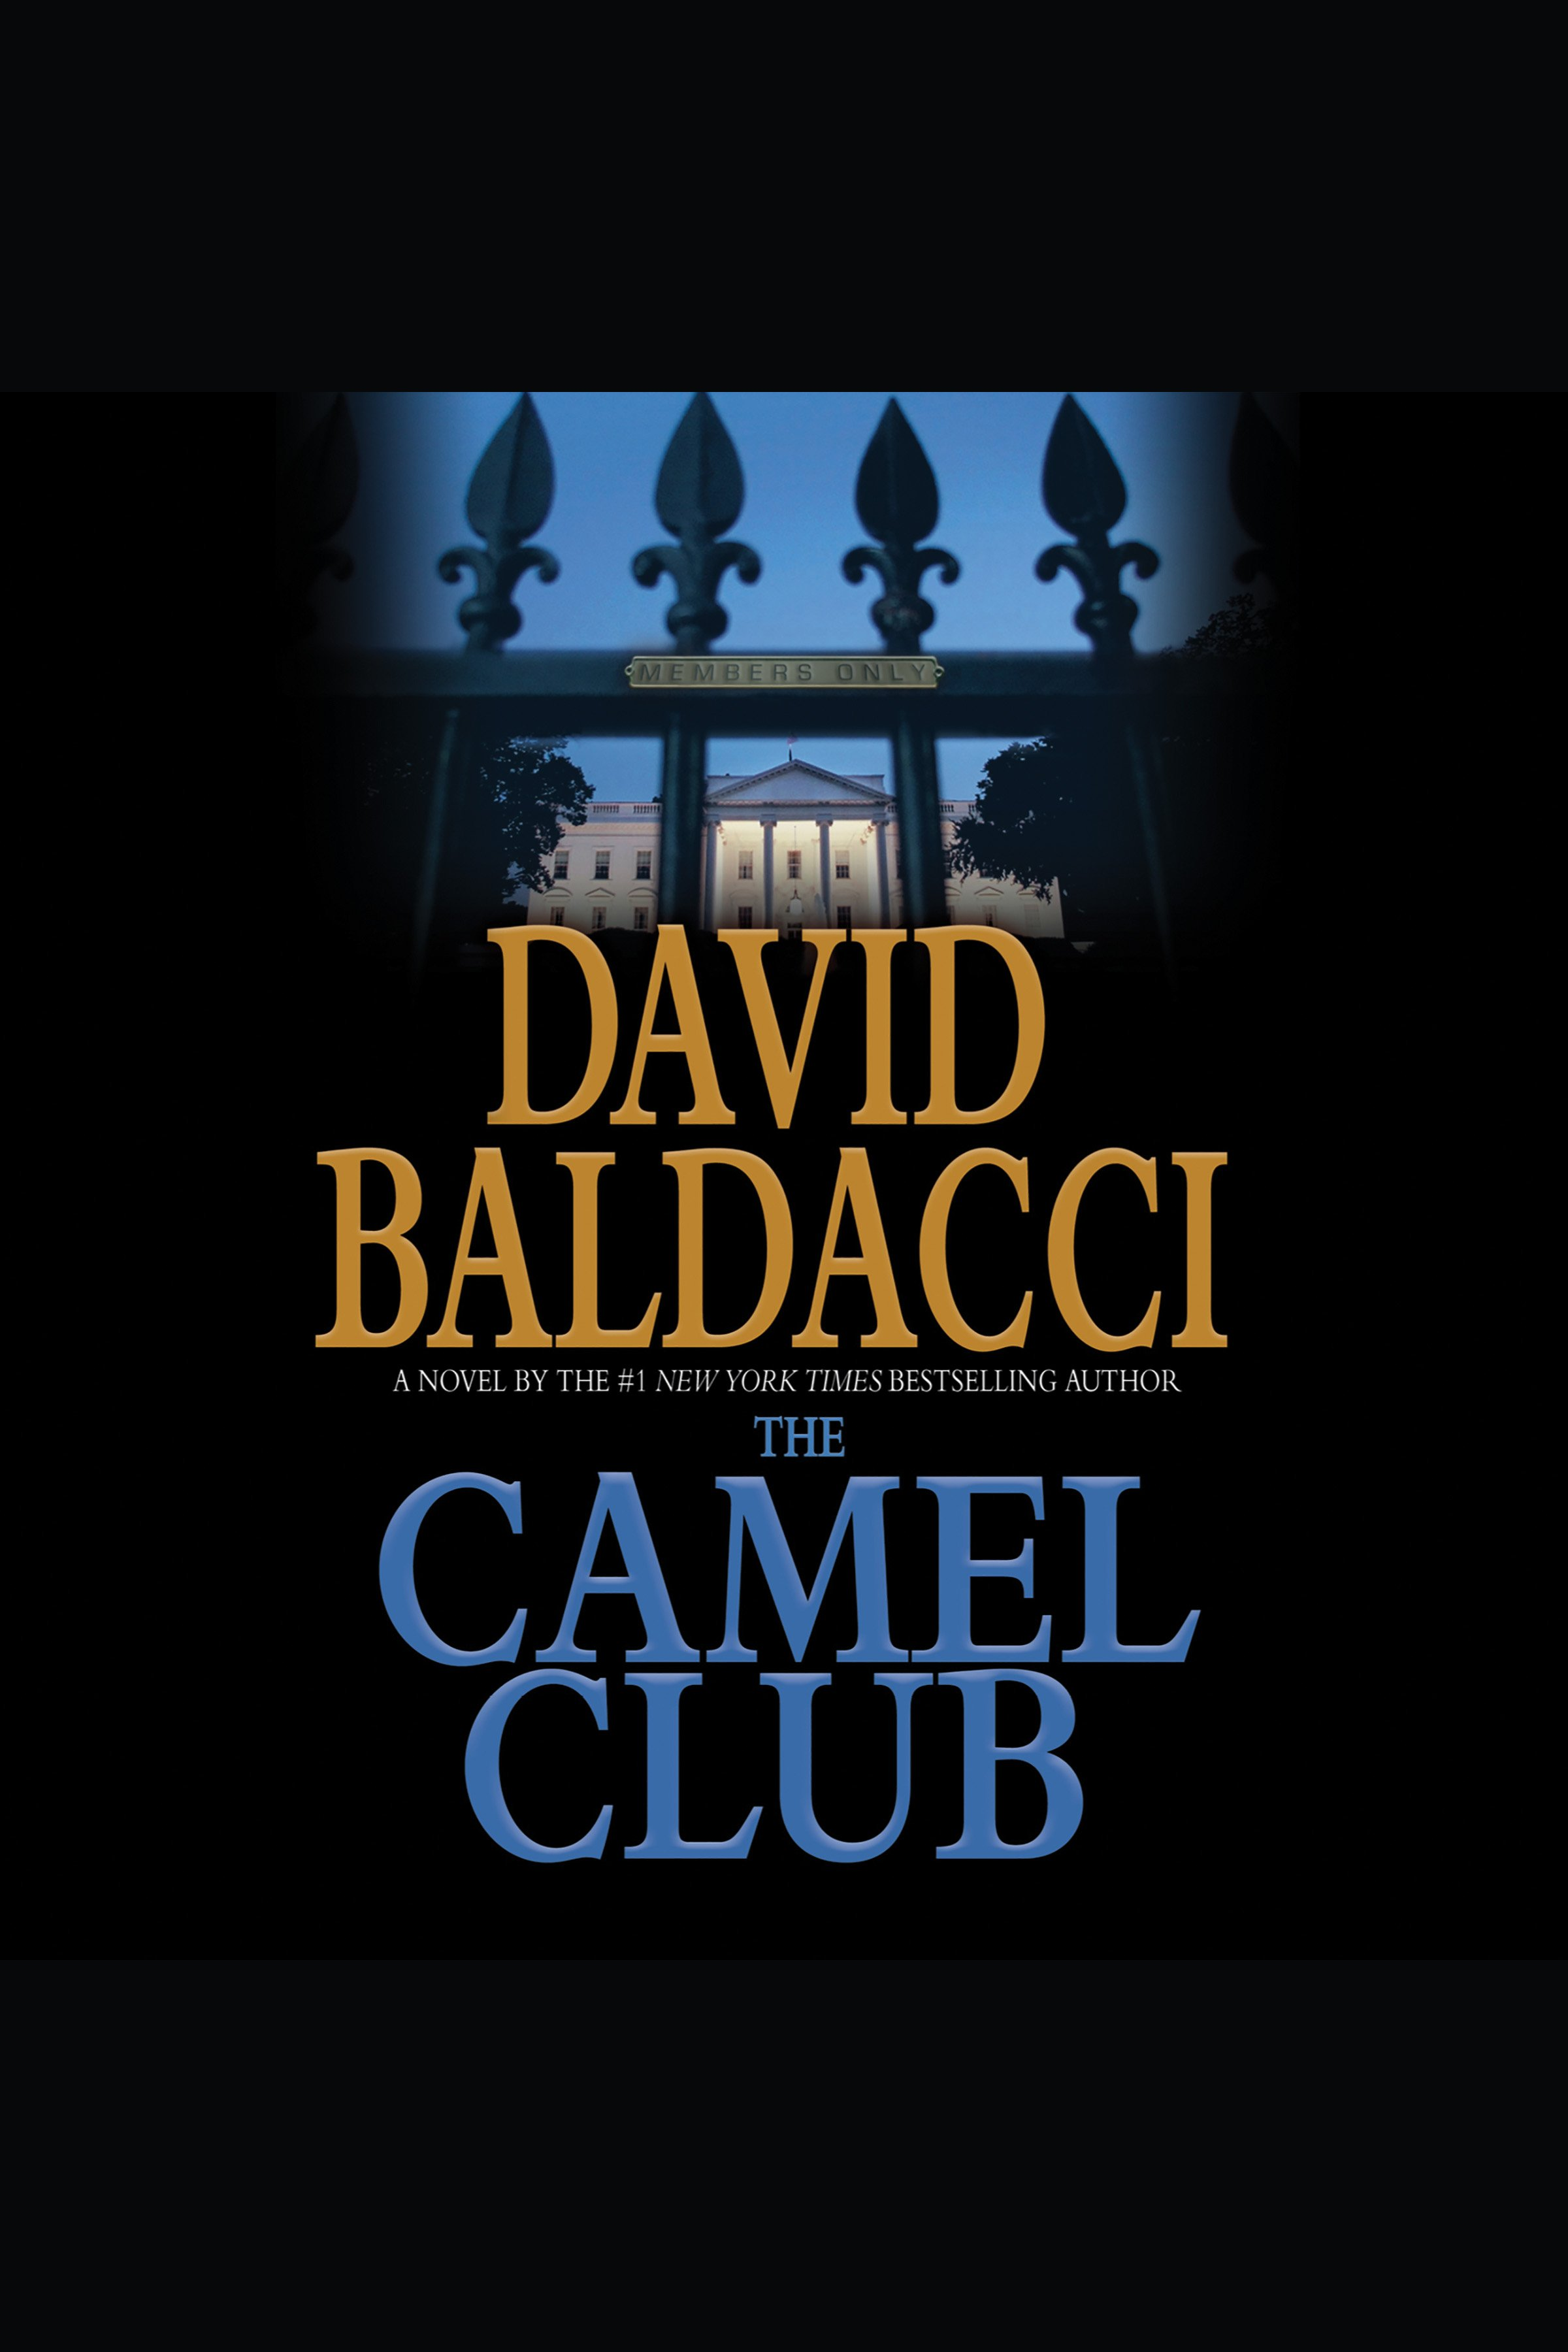 Camel Club, The